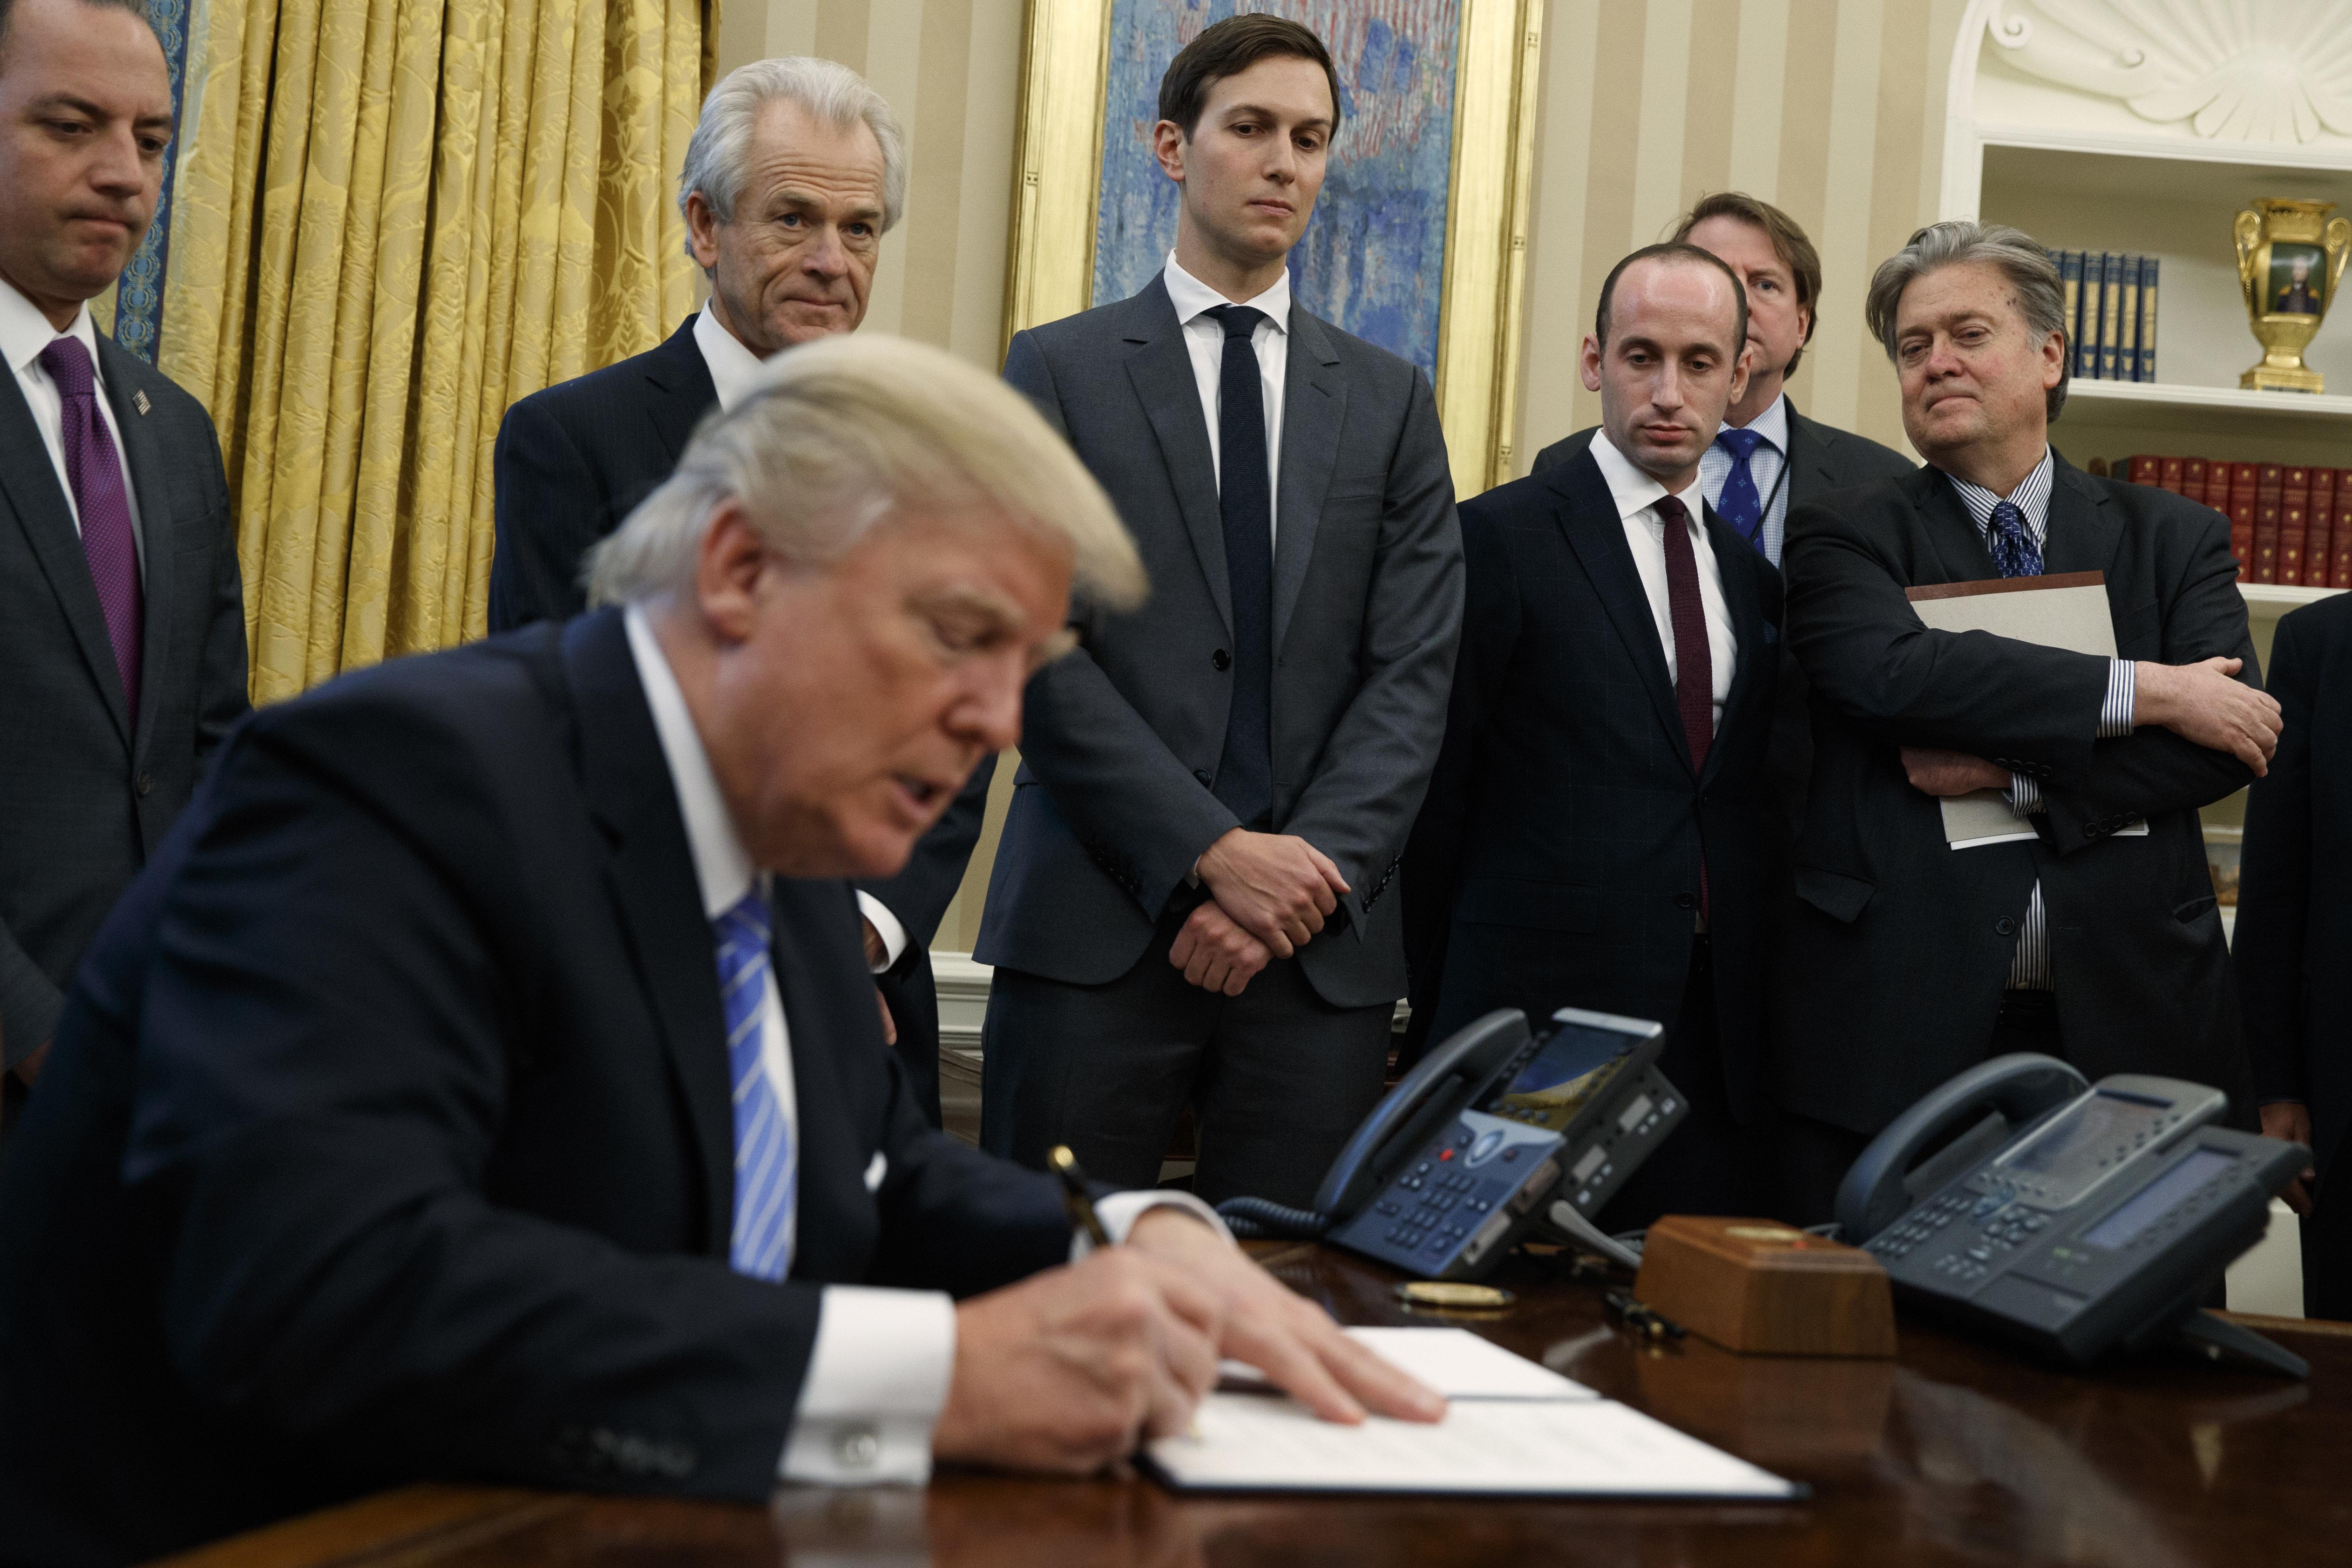 L-R:White House Chief of Staff Reince Priebus, National Trade Council adviser Peter Navarro, Senior...